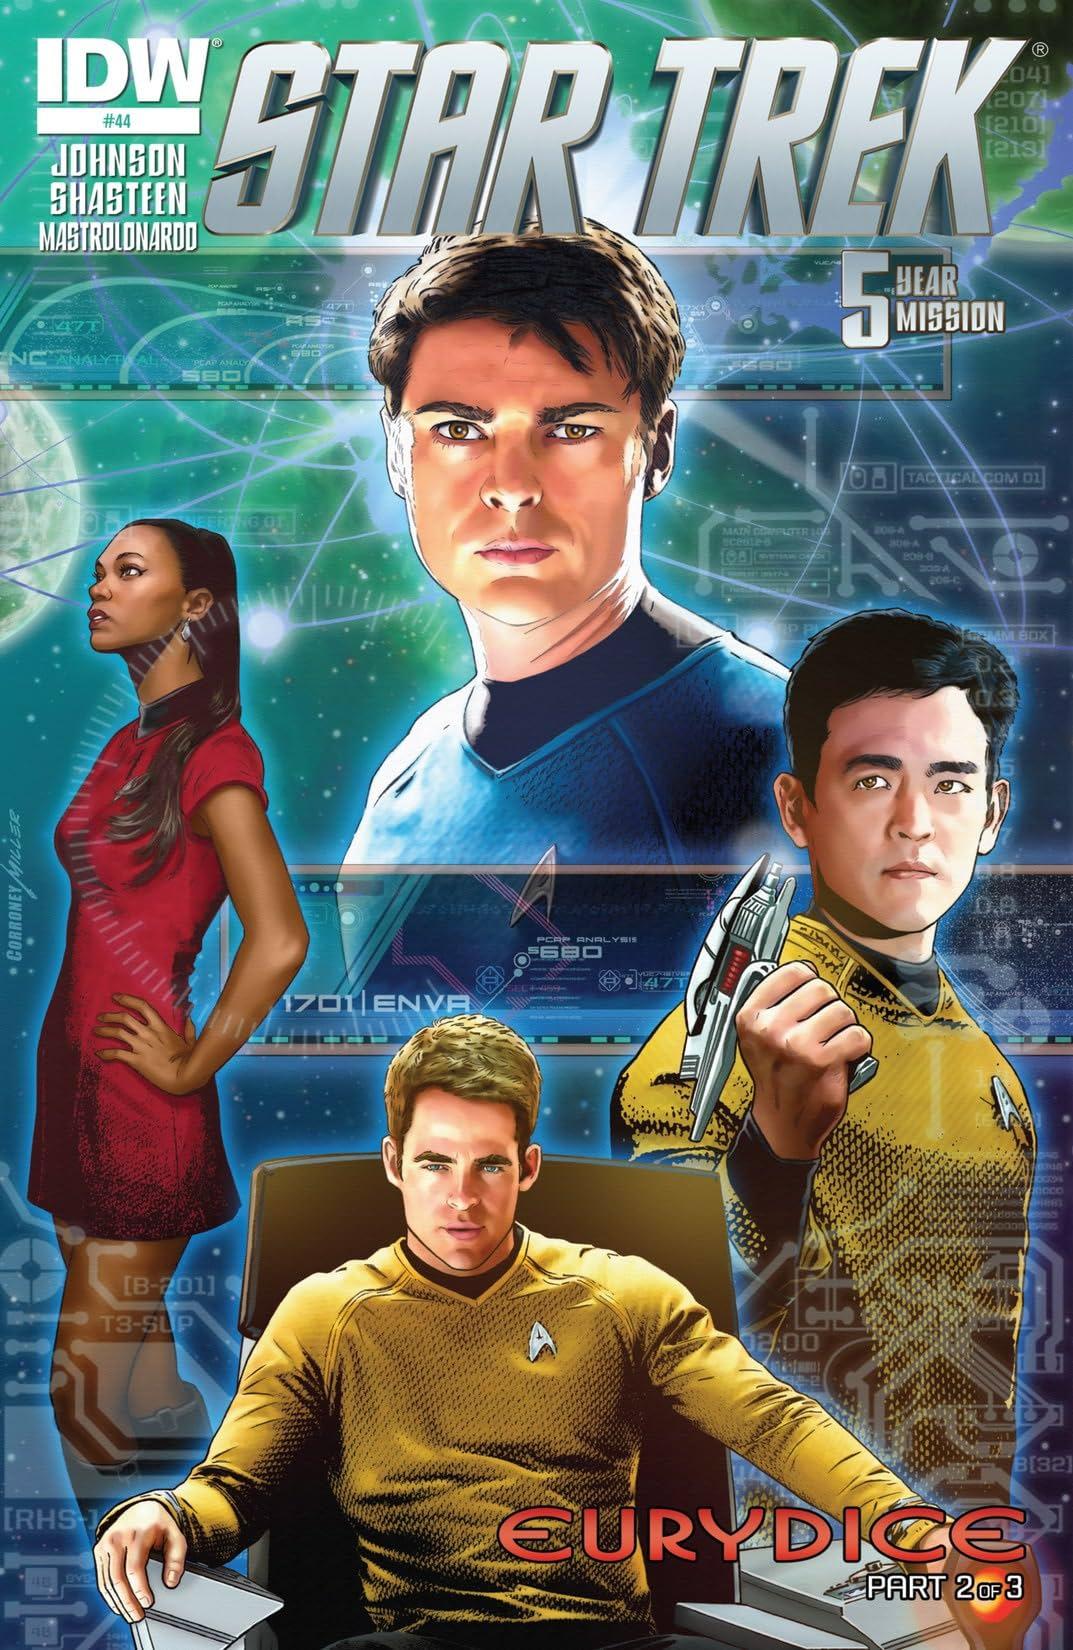 Star Trek (2011-2016) #44: Five-Year Mission